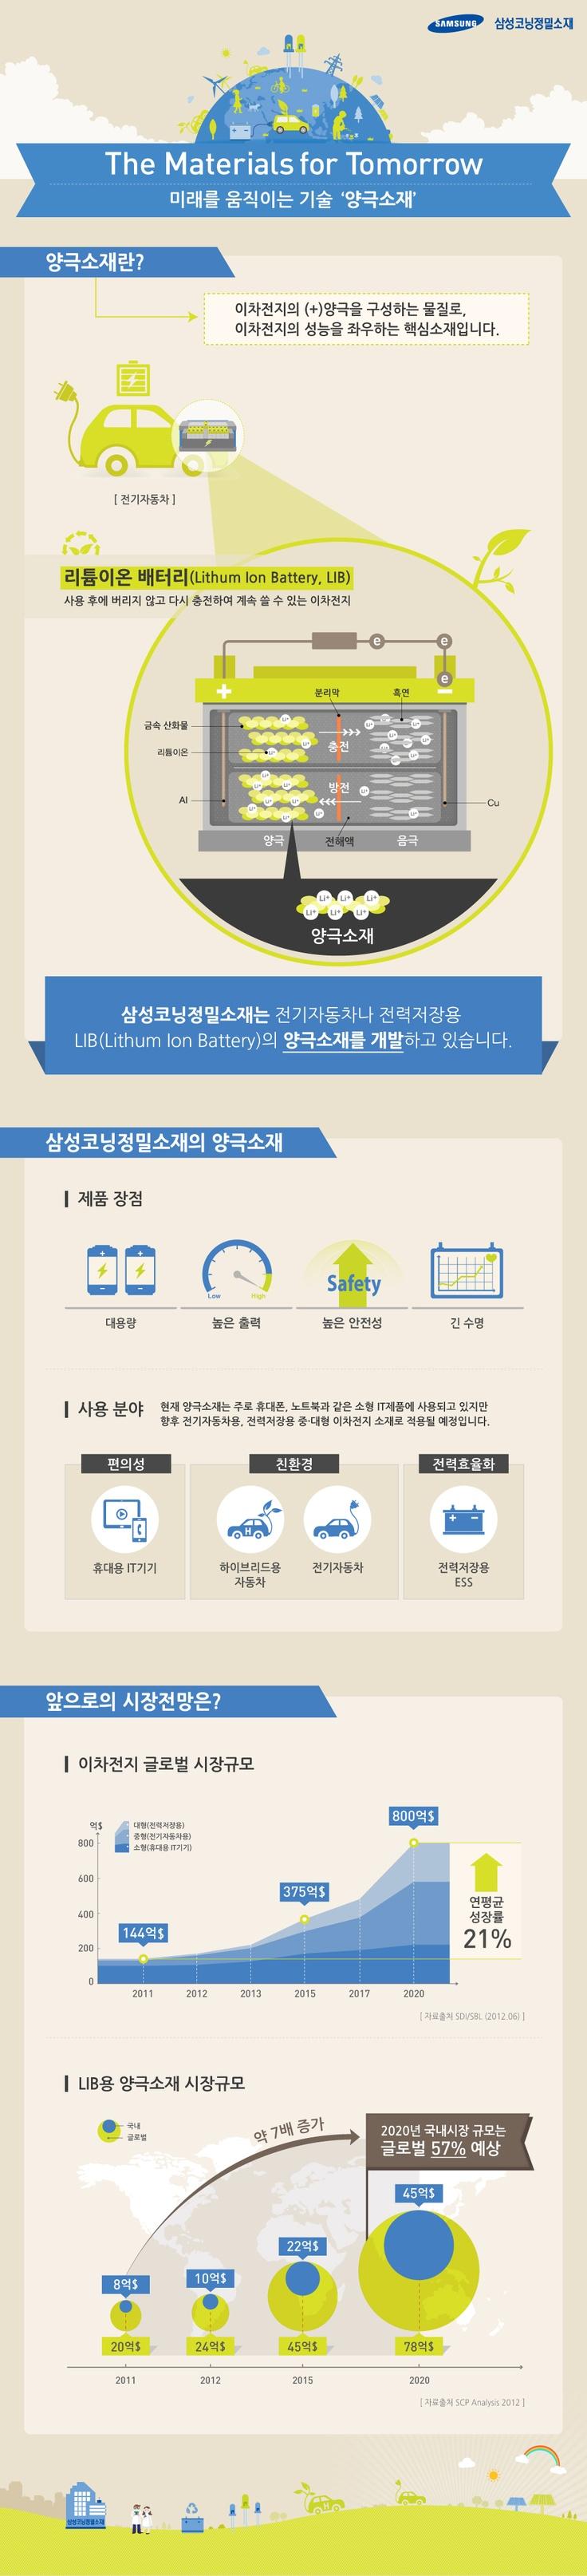 [Infographic] 미래를 움직이는 기술 '양극소재'에 관한 인포그래픽